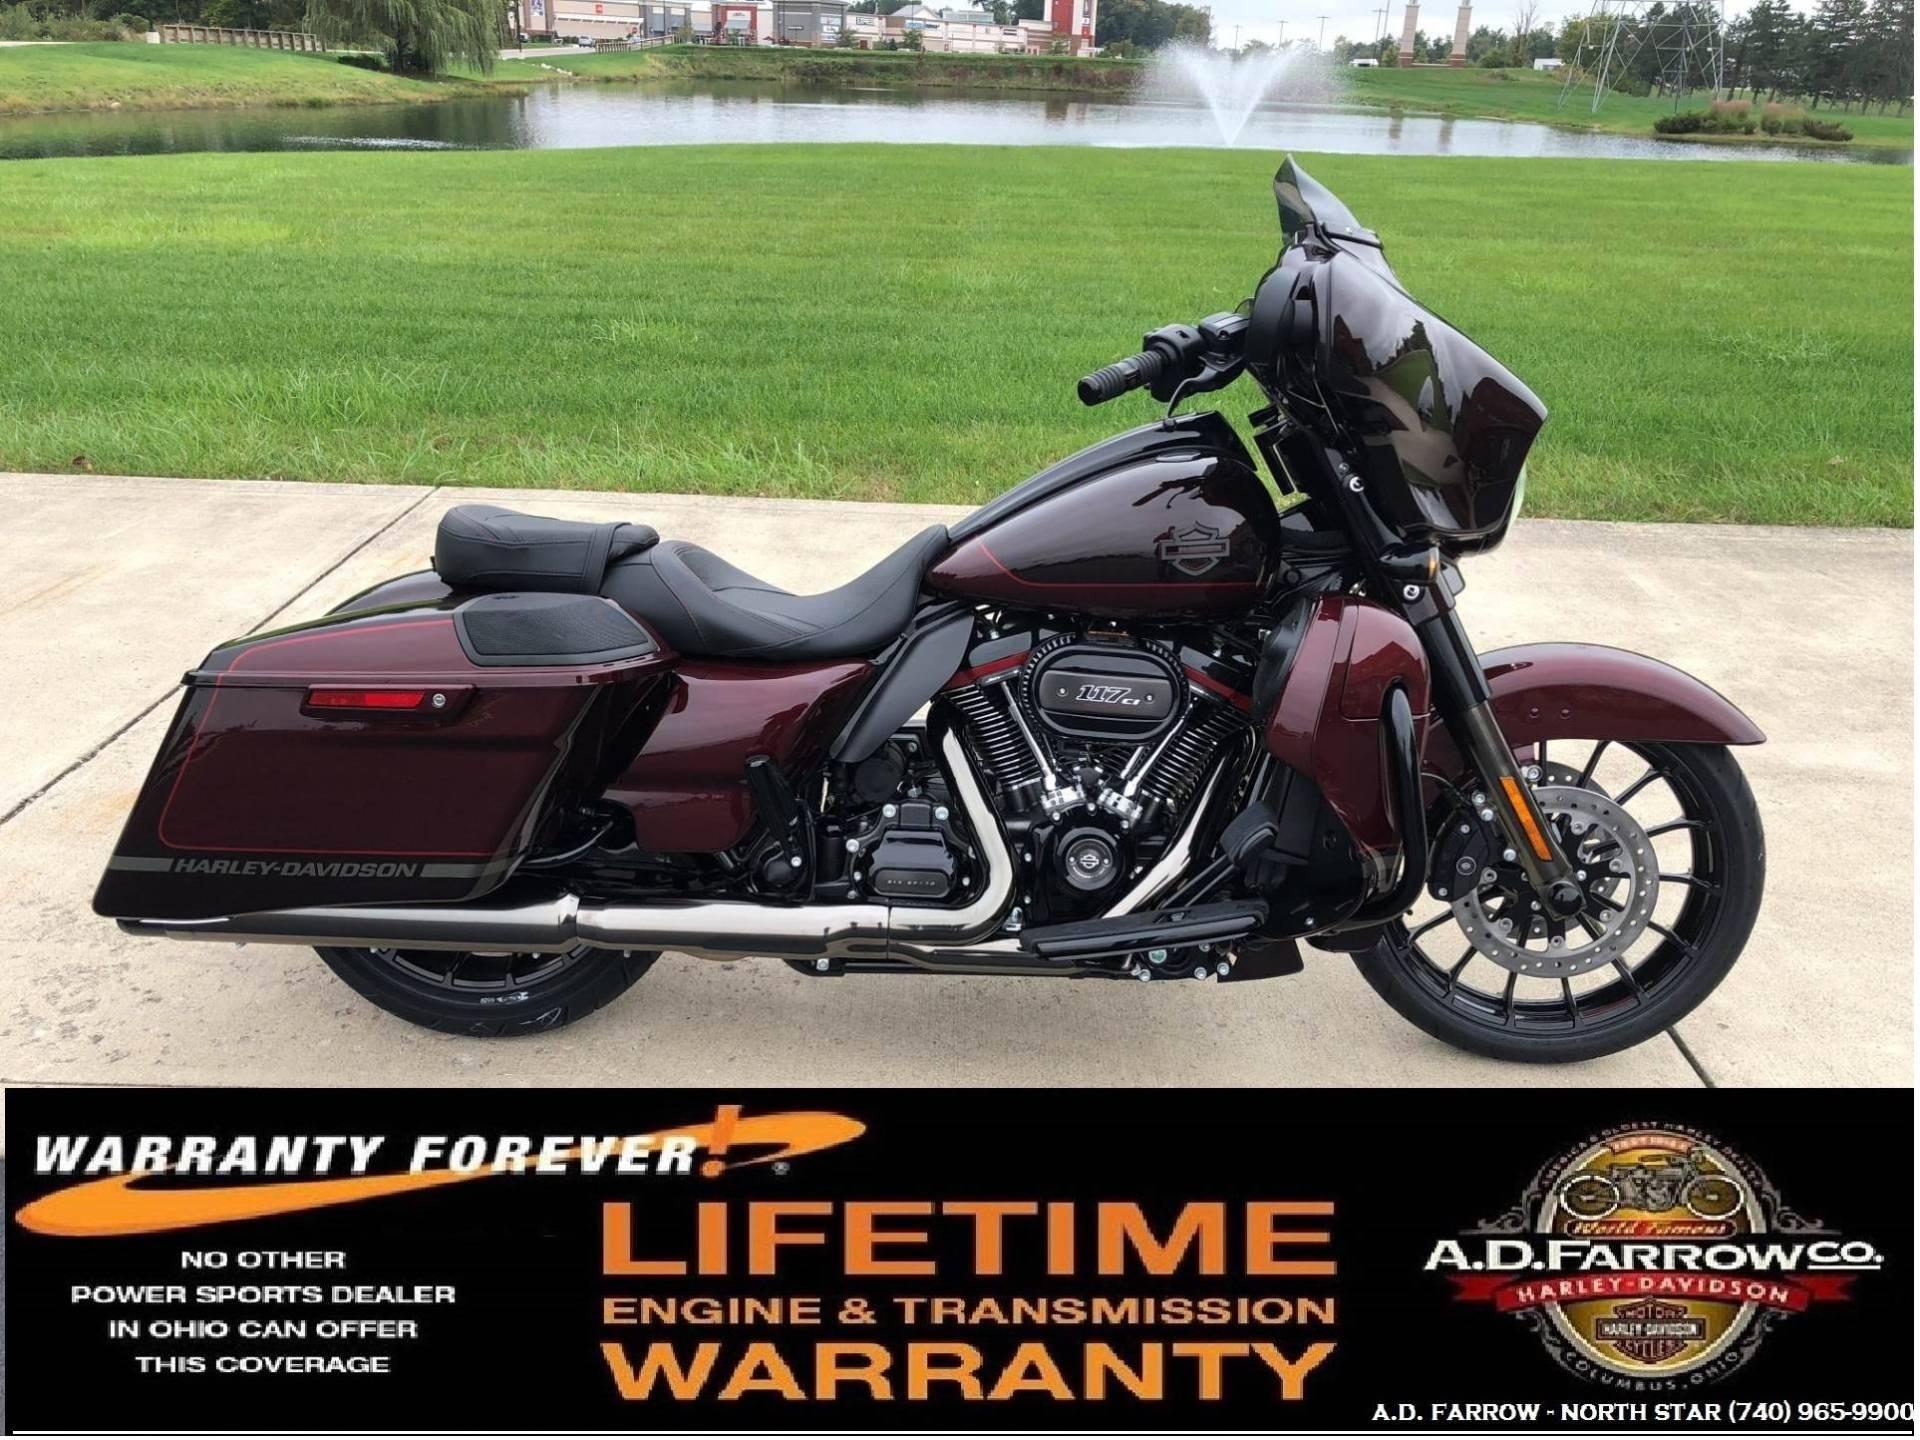 3e4fdeb0e70 2019 Harley-Davidson CVO Street Glide Motorcycles Sunbury Ohio